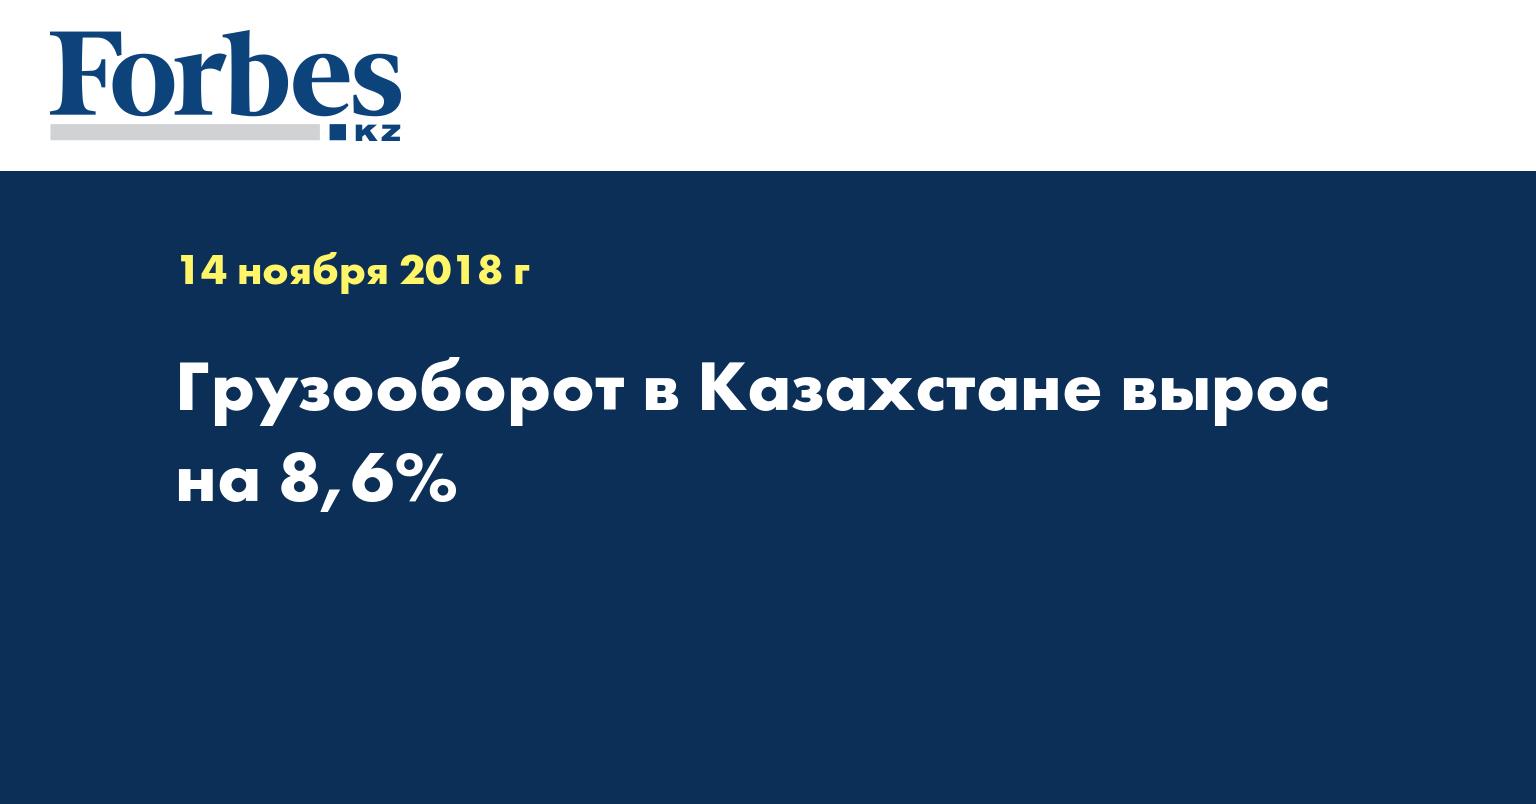 Грузооборот в Казахстане вырос на 8,6%